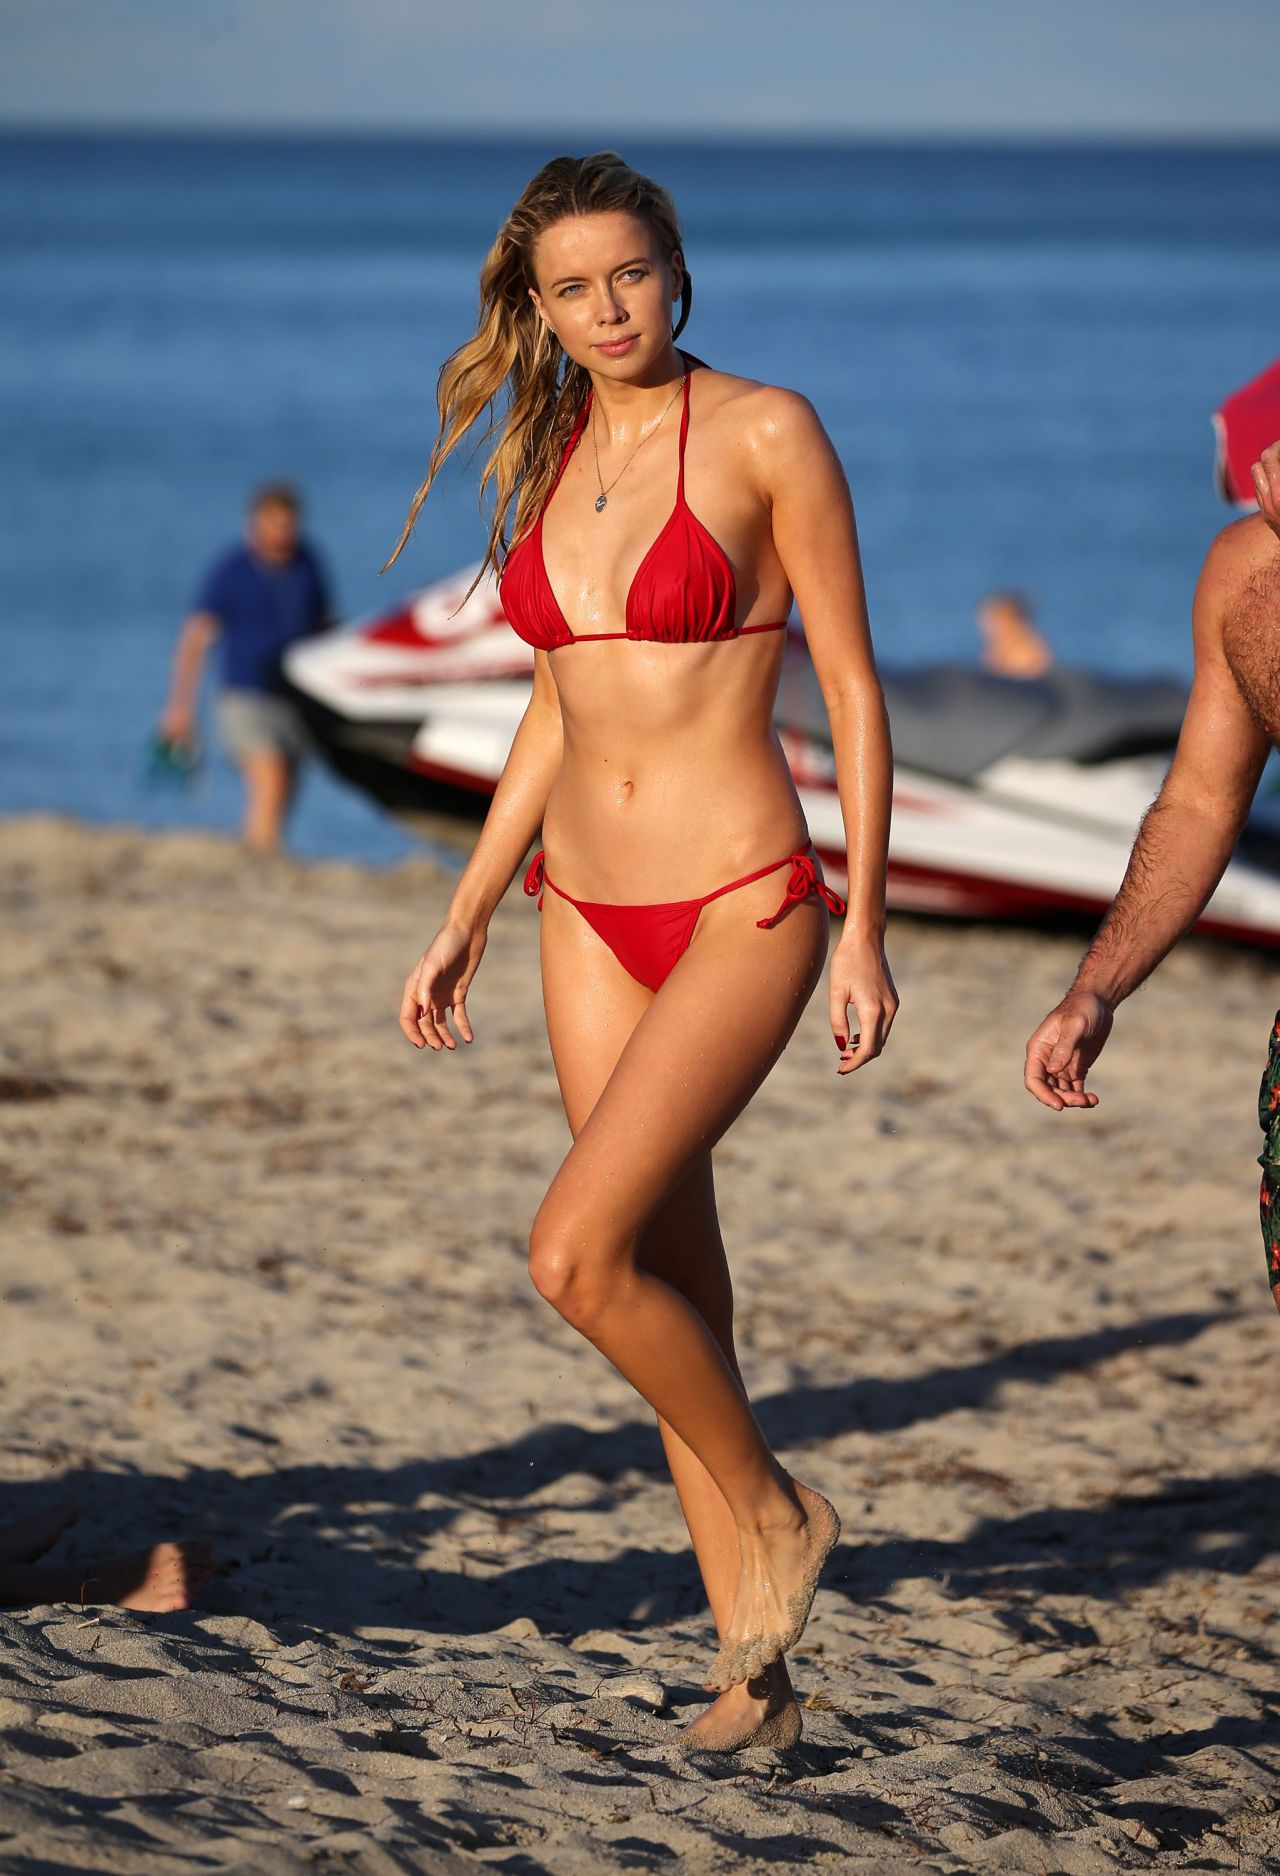 Bikini Samantha Jade nudes (75 photos), Pussy, Leaked, Twitter, in bikini 2020